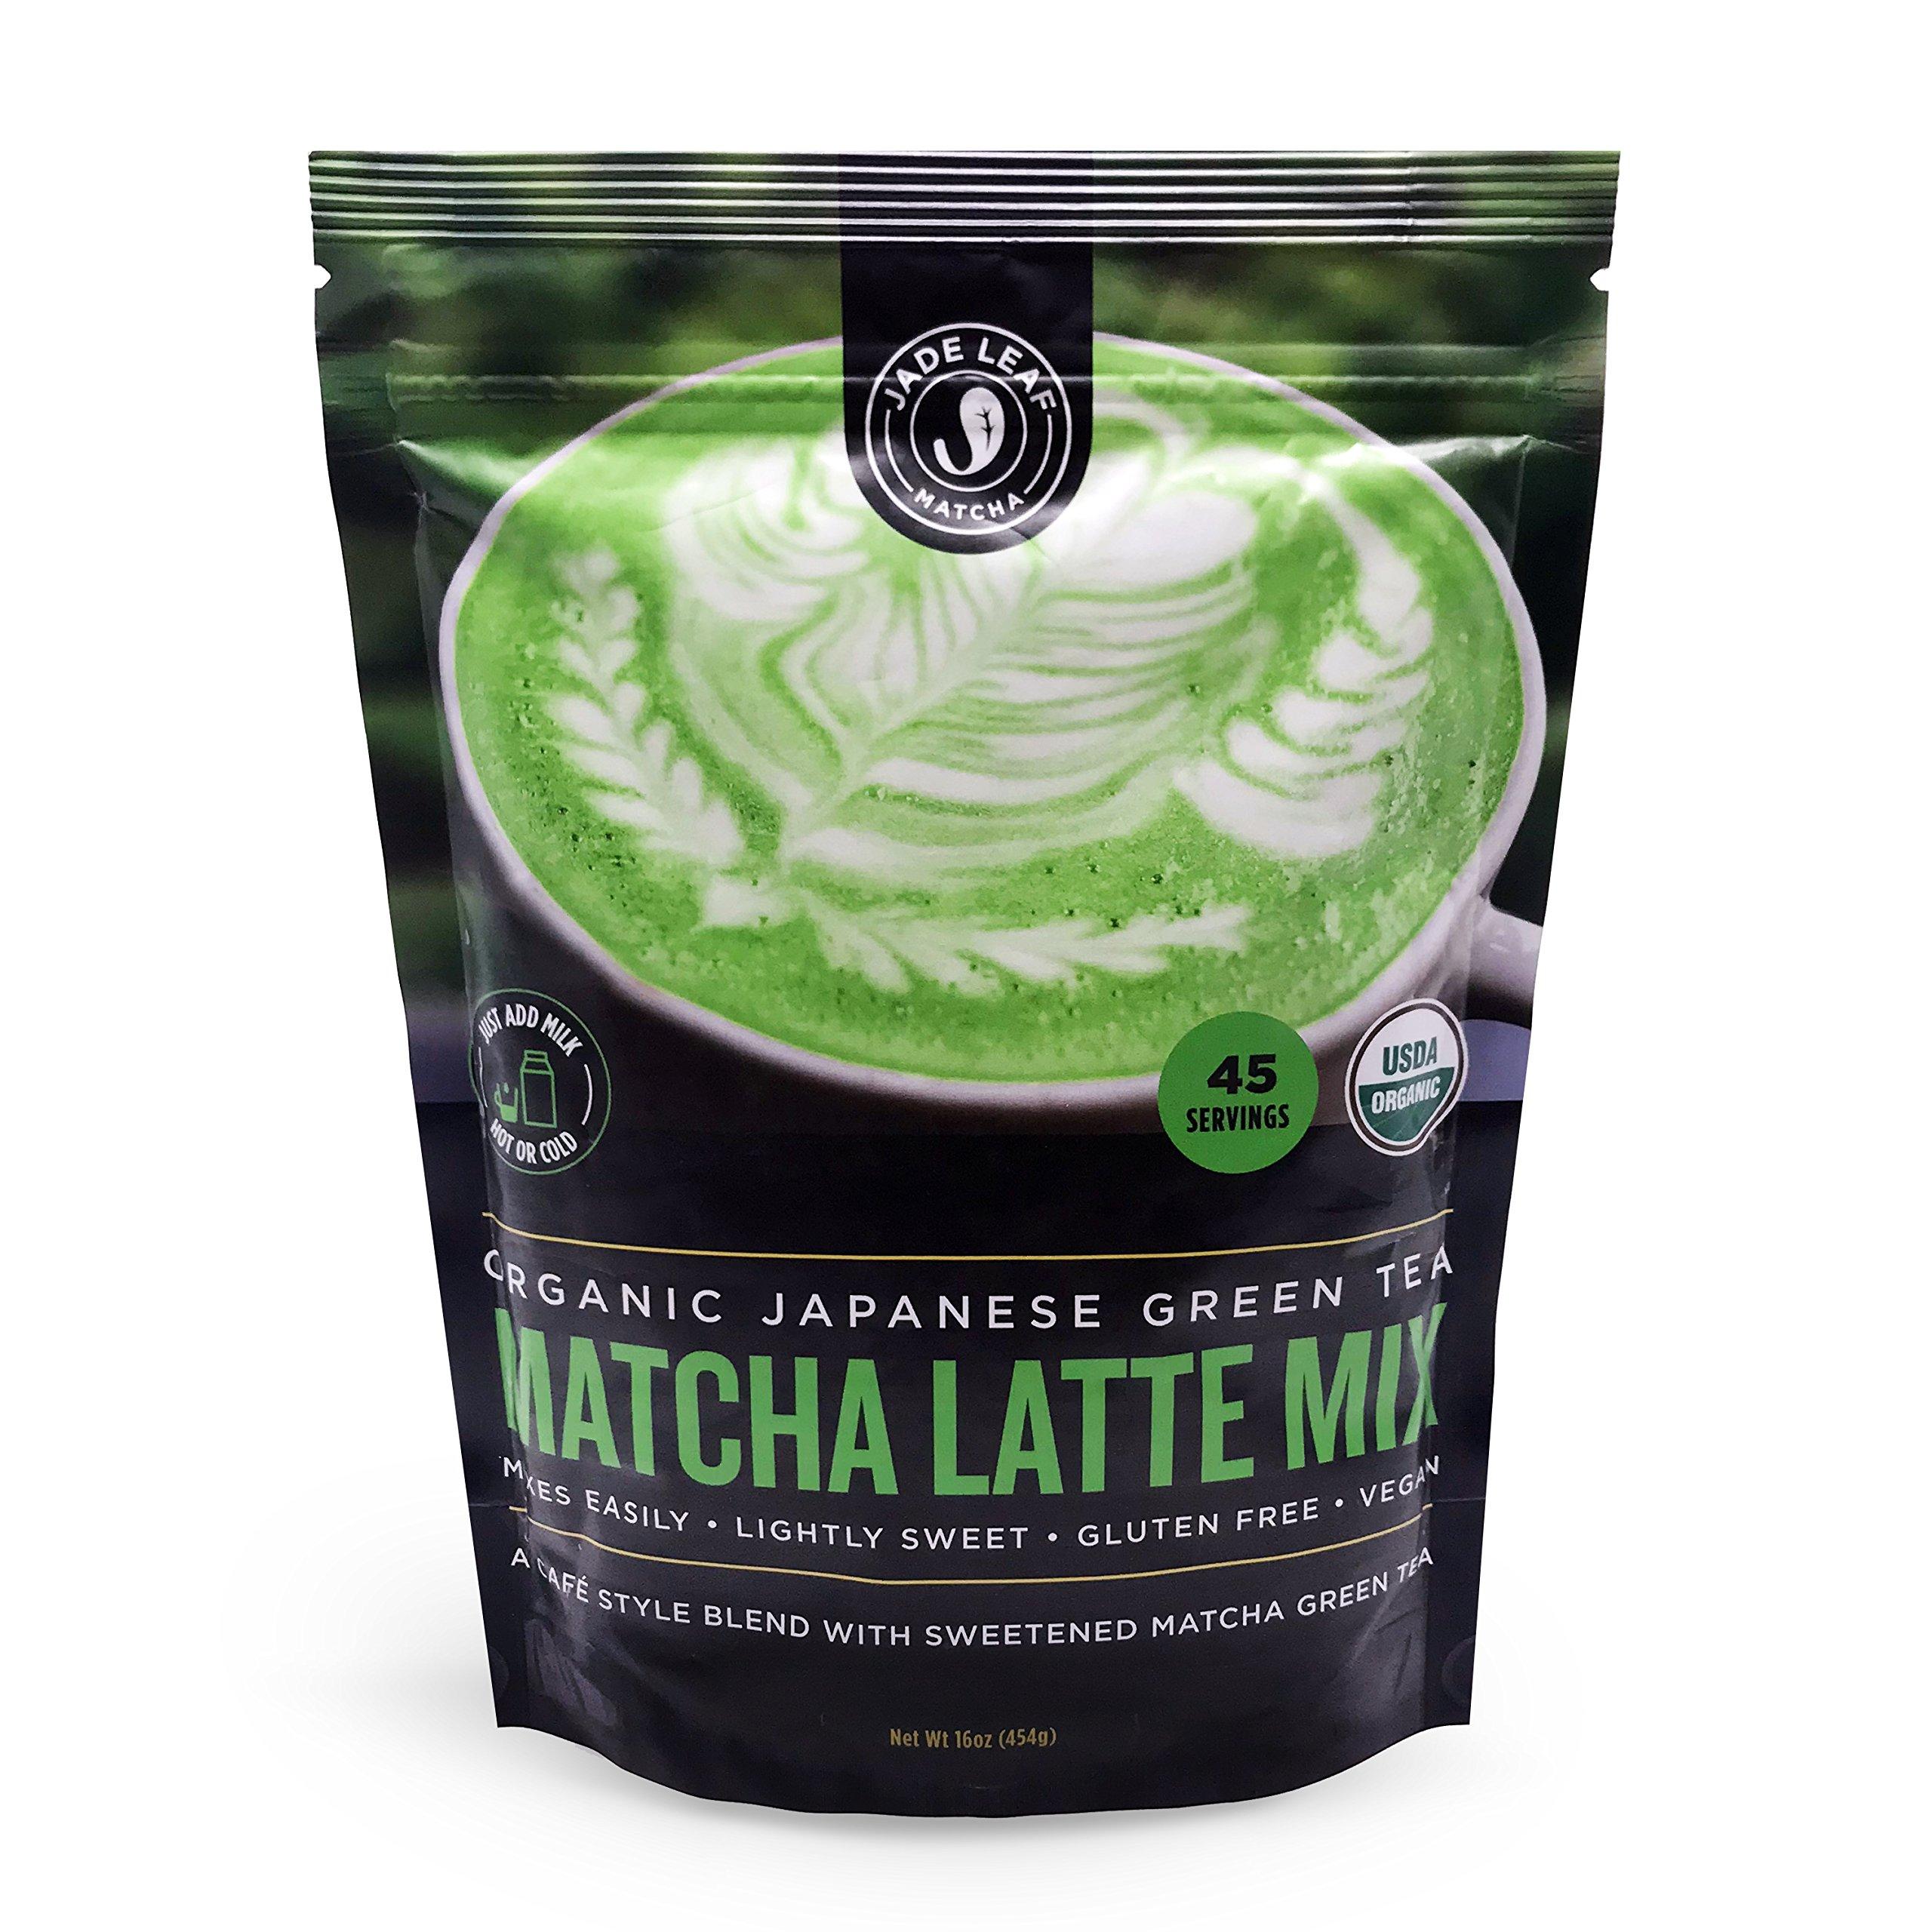 Jade Leaf - Organic Japanese Matcha Latte Mix - Cafe Style Sweetened Blend - Sweet Matcha Green Tea Powder [1lb Pouch] by Jade Leaf Matcha